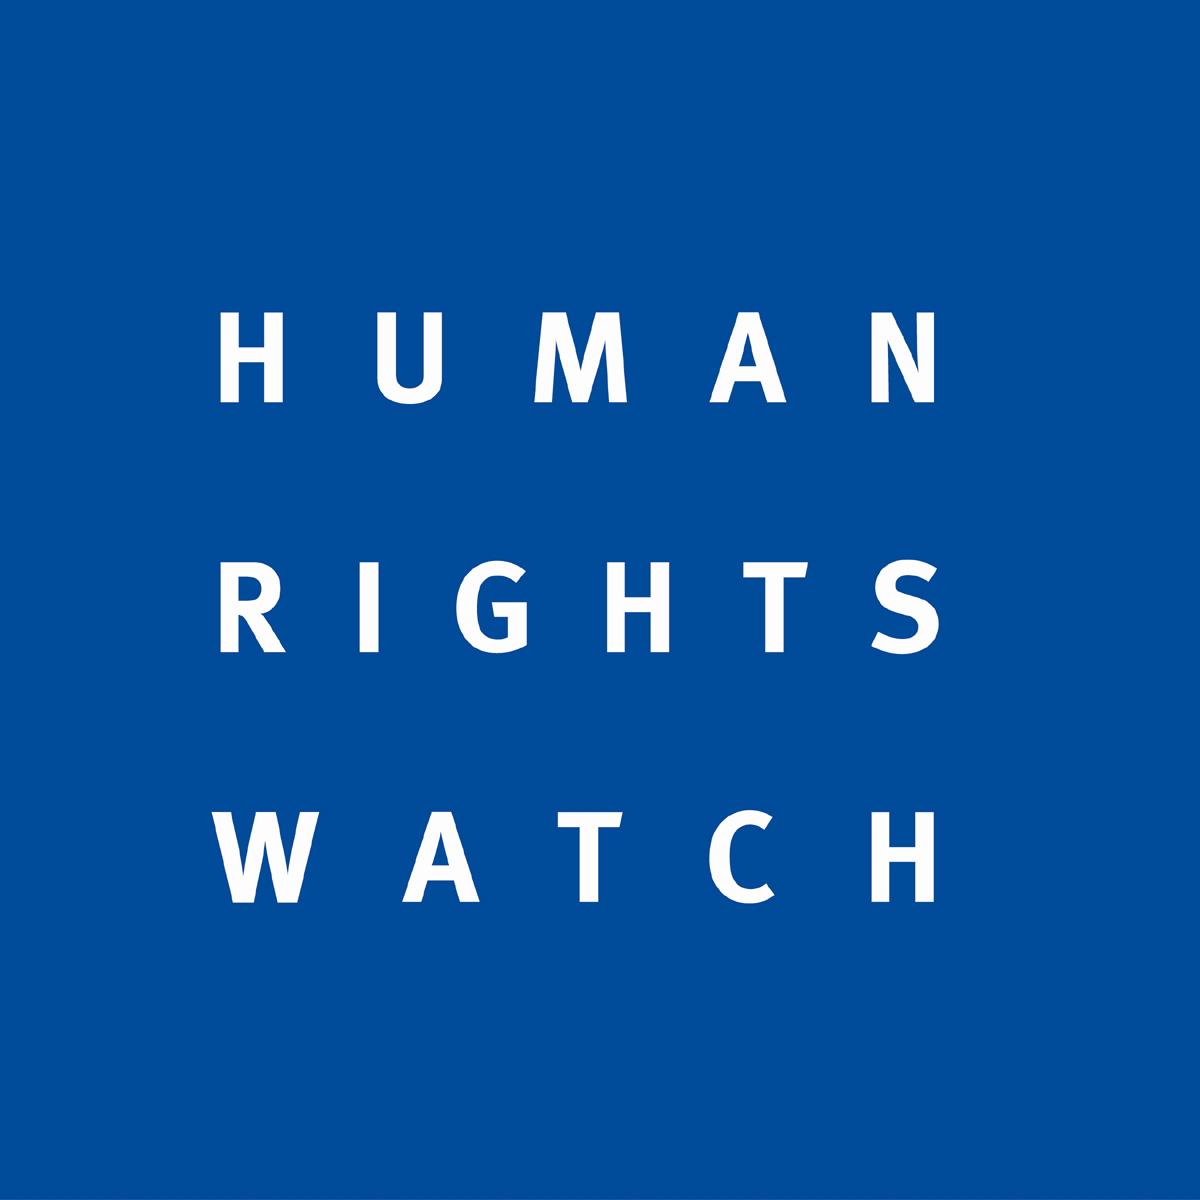 HumanRightsWatcgLogo.jpg